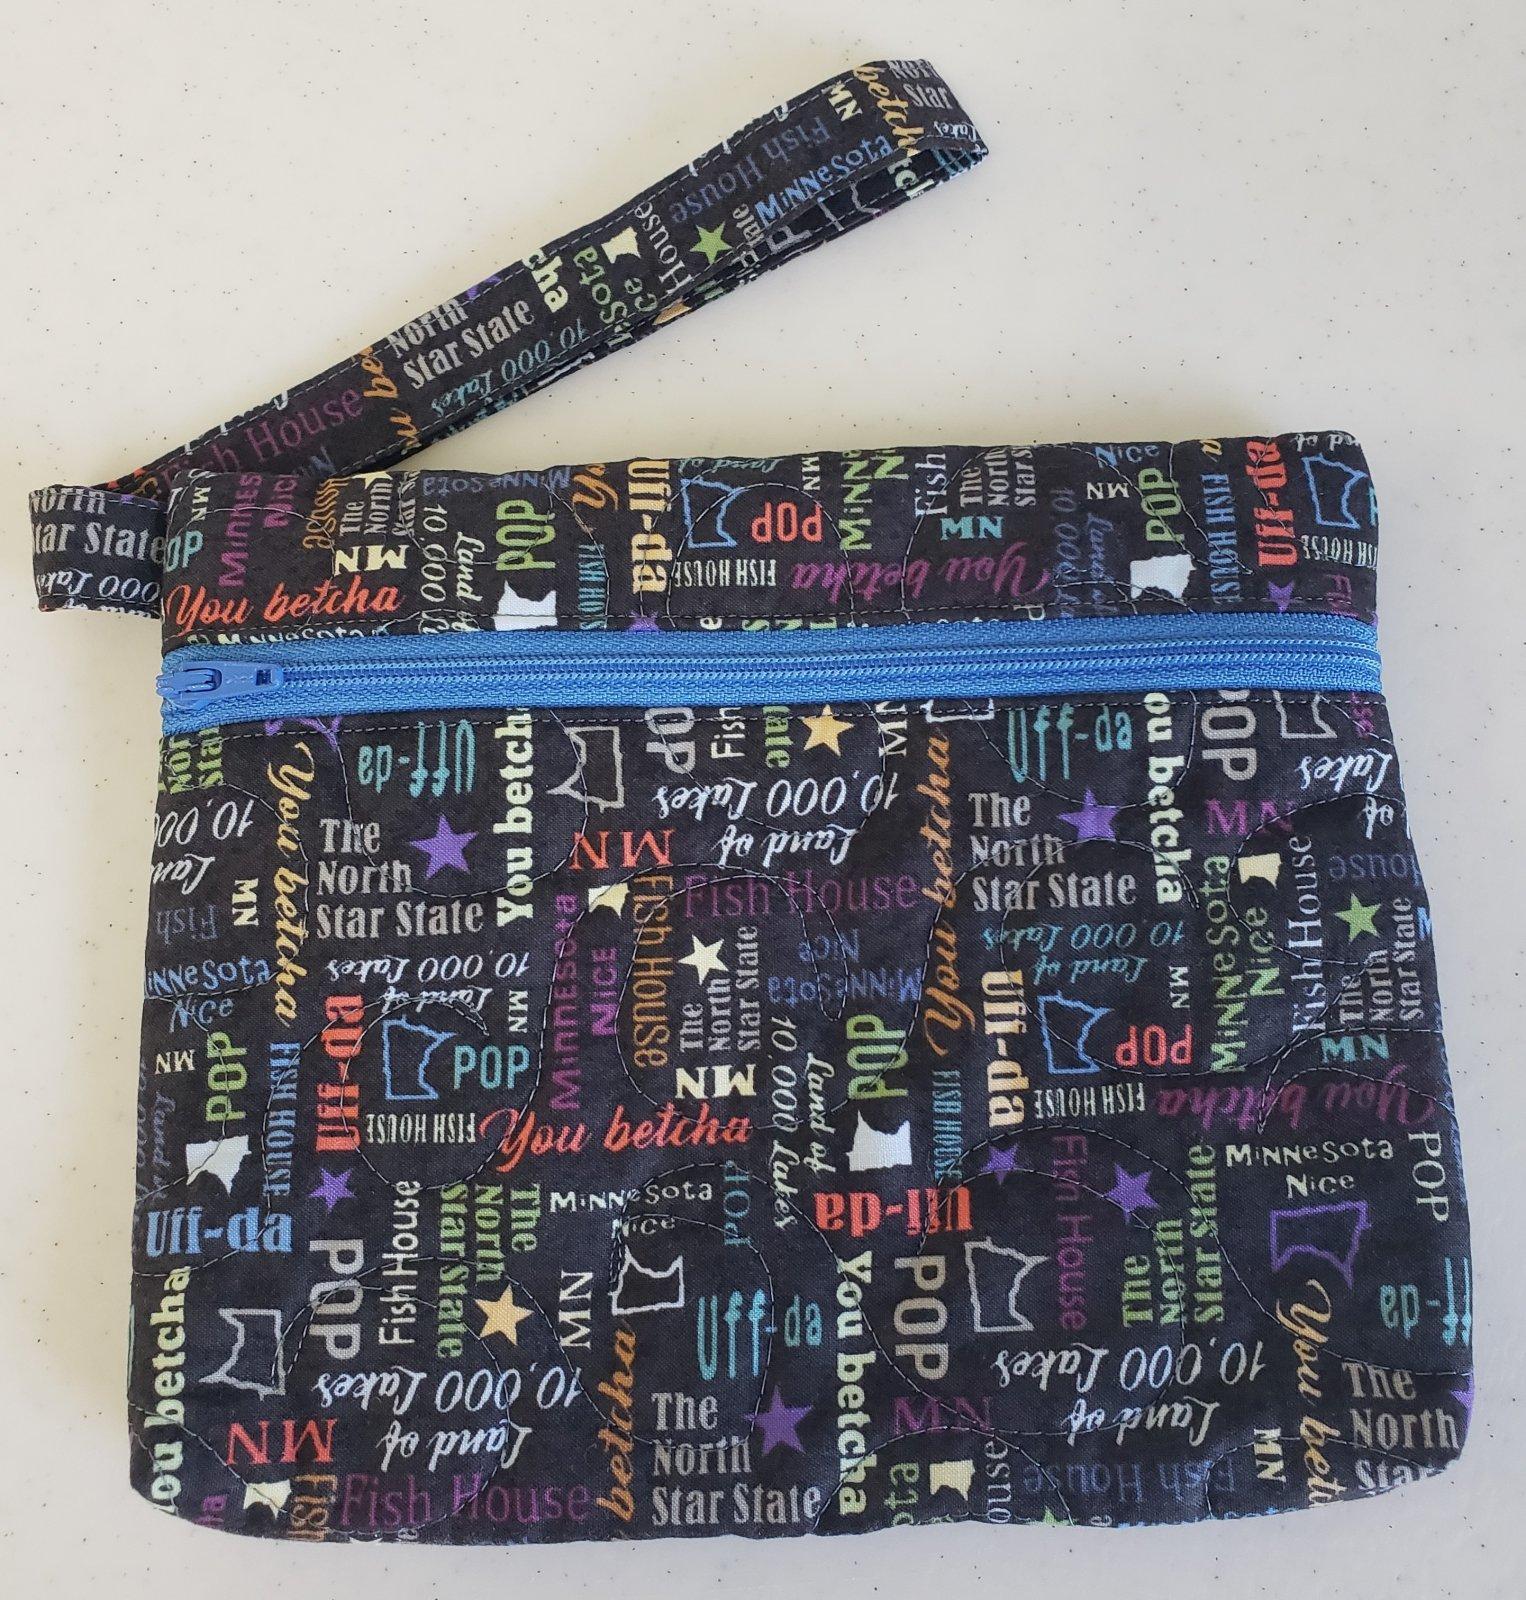 Quilt MN 2020 Quick Zip Bag Kit